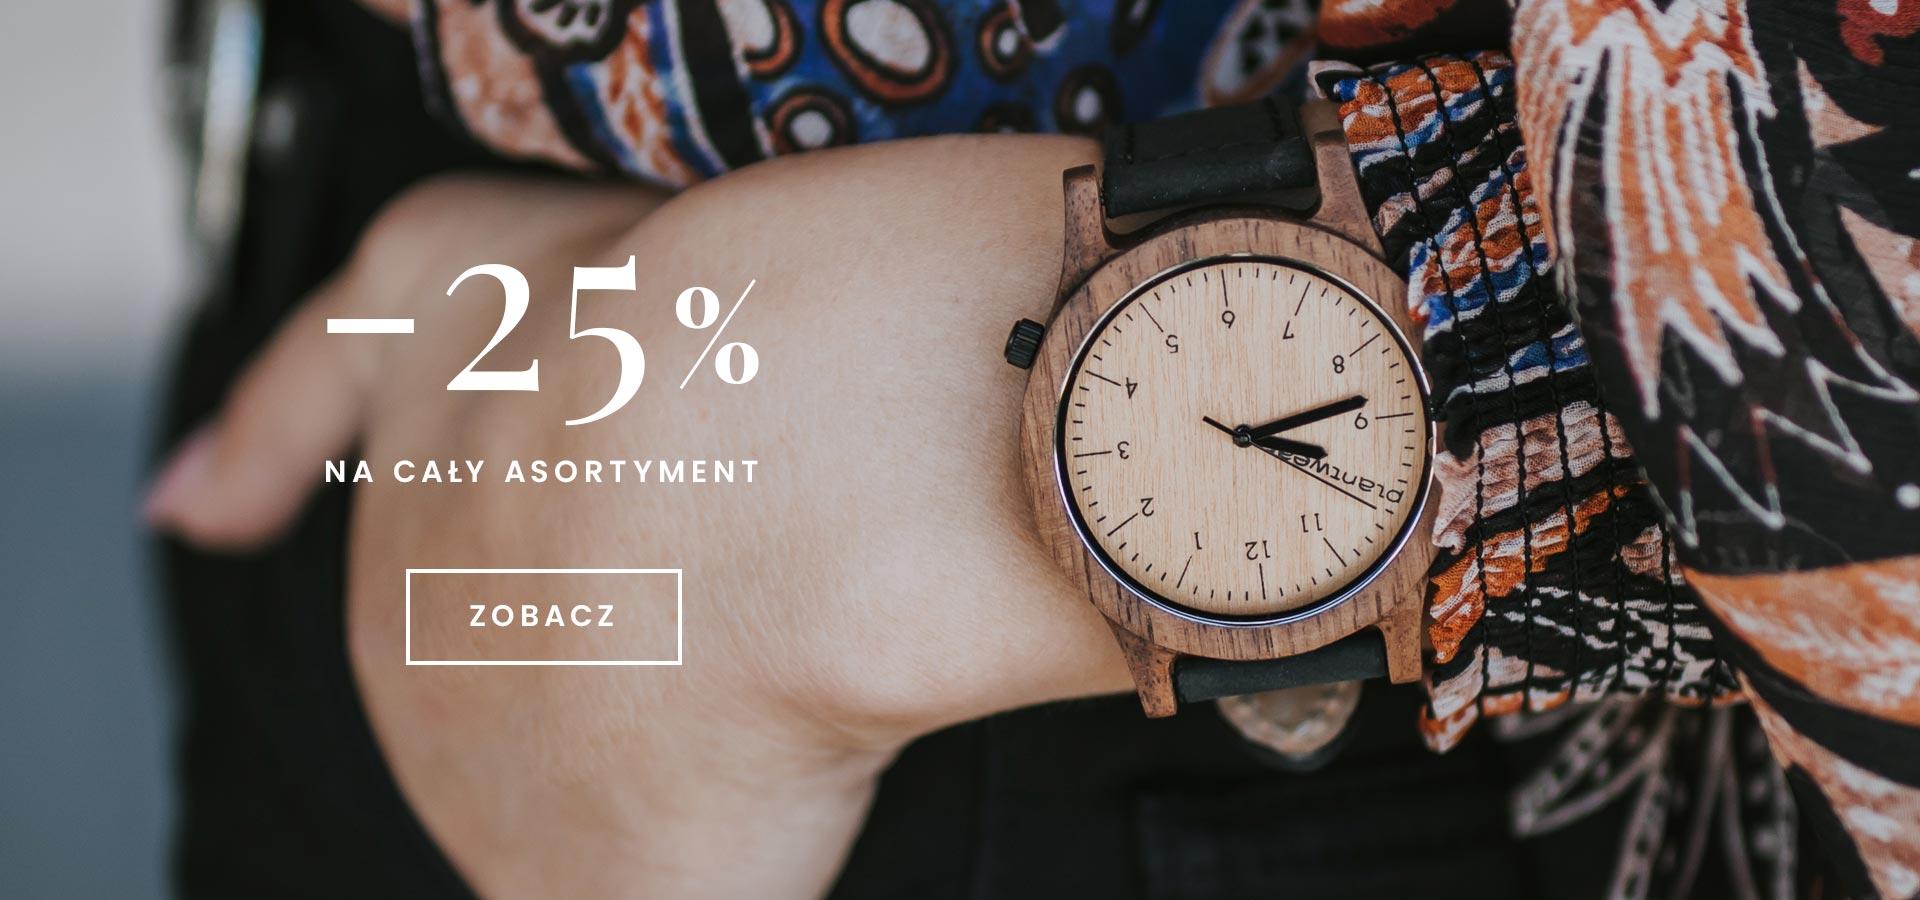 -25% nawszystko!